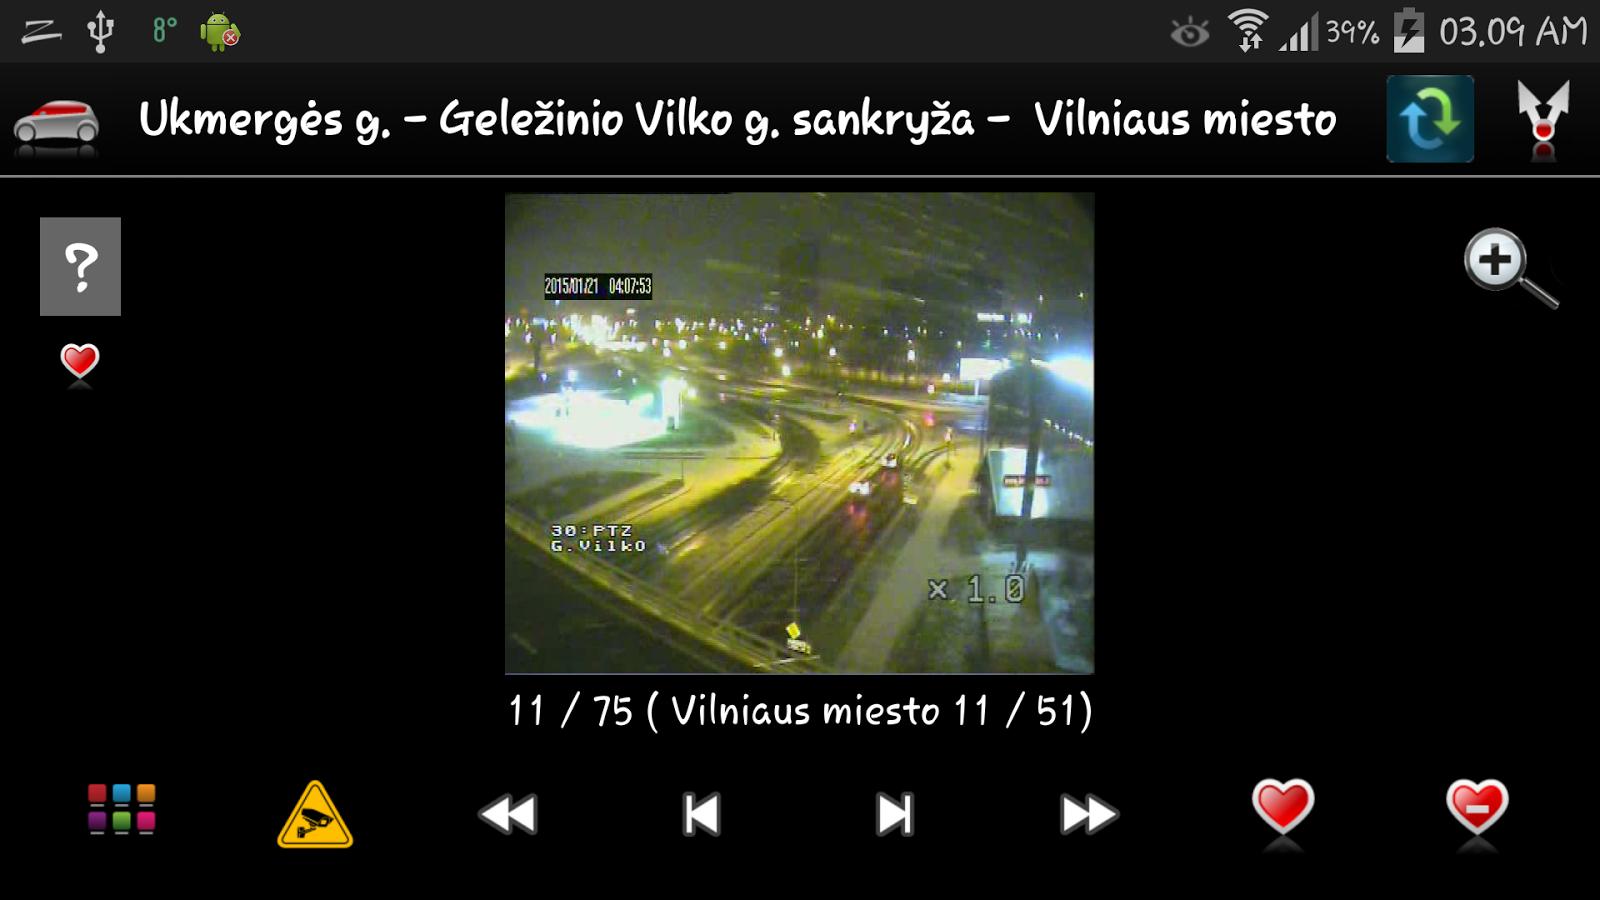 Lietuvos kameros - screenshot